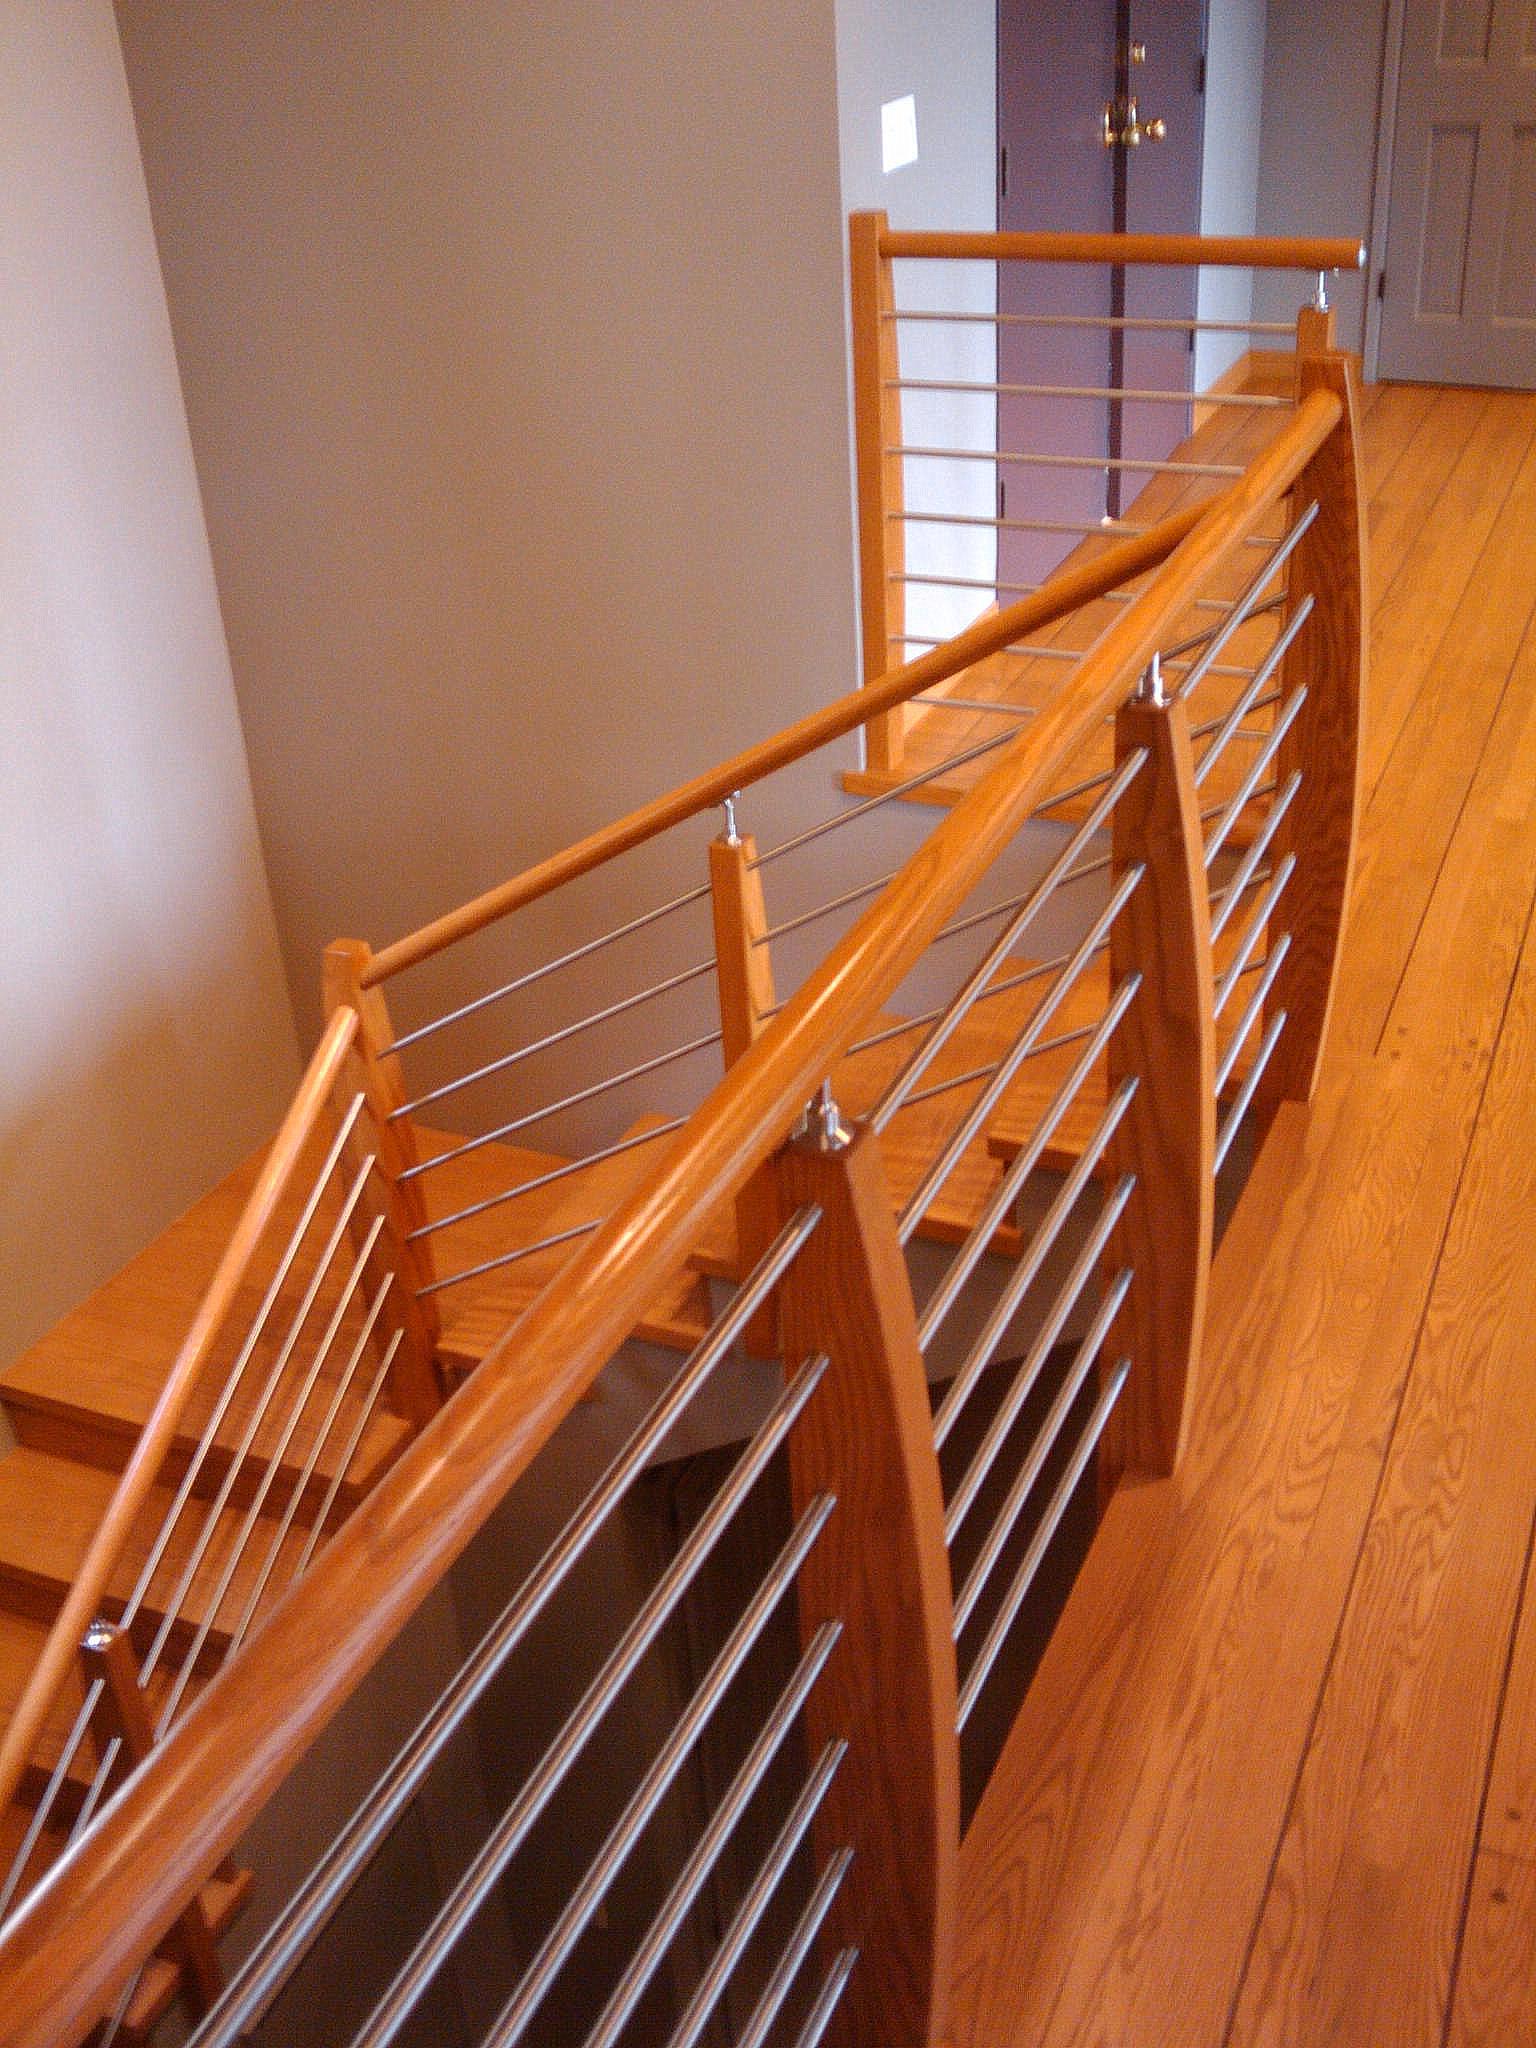 Oak Pointe_Handrail and Fittings (7).jpg